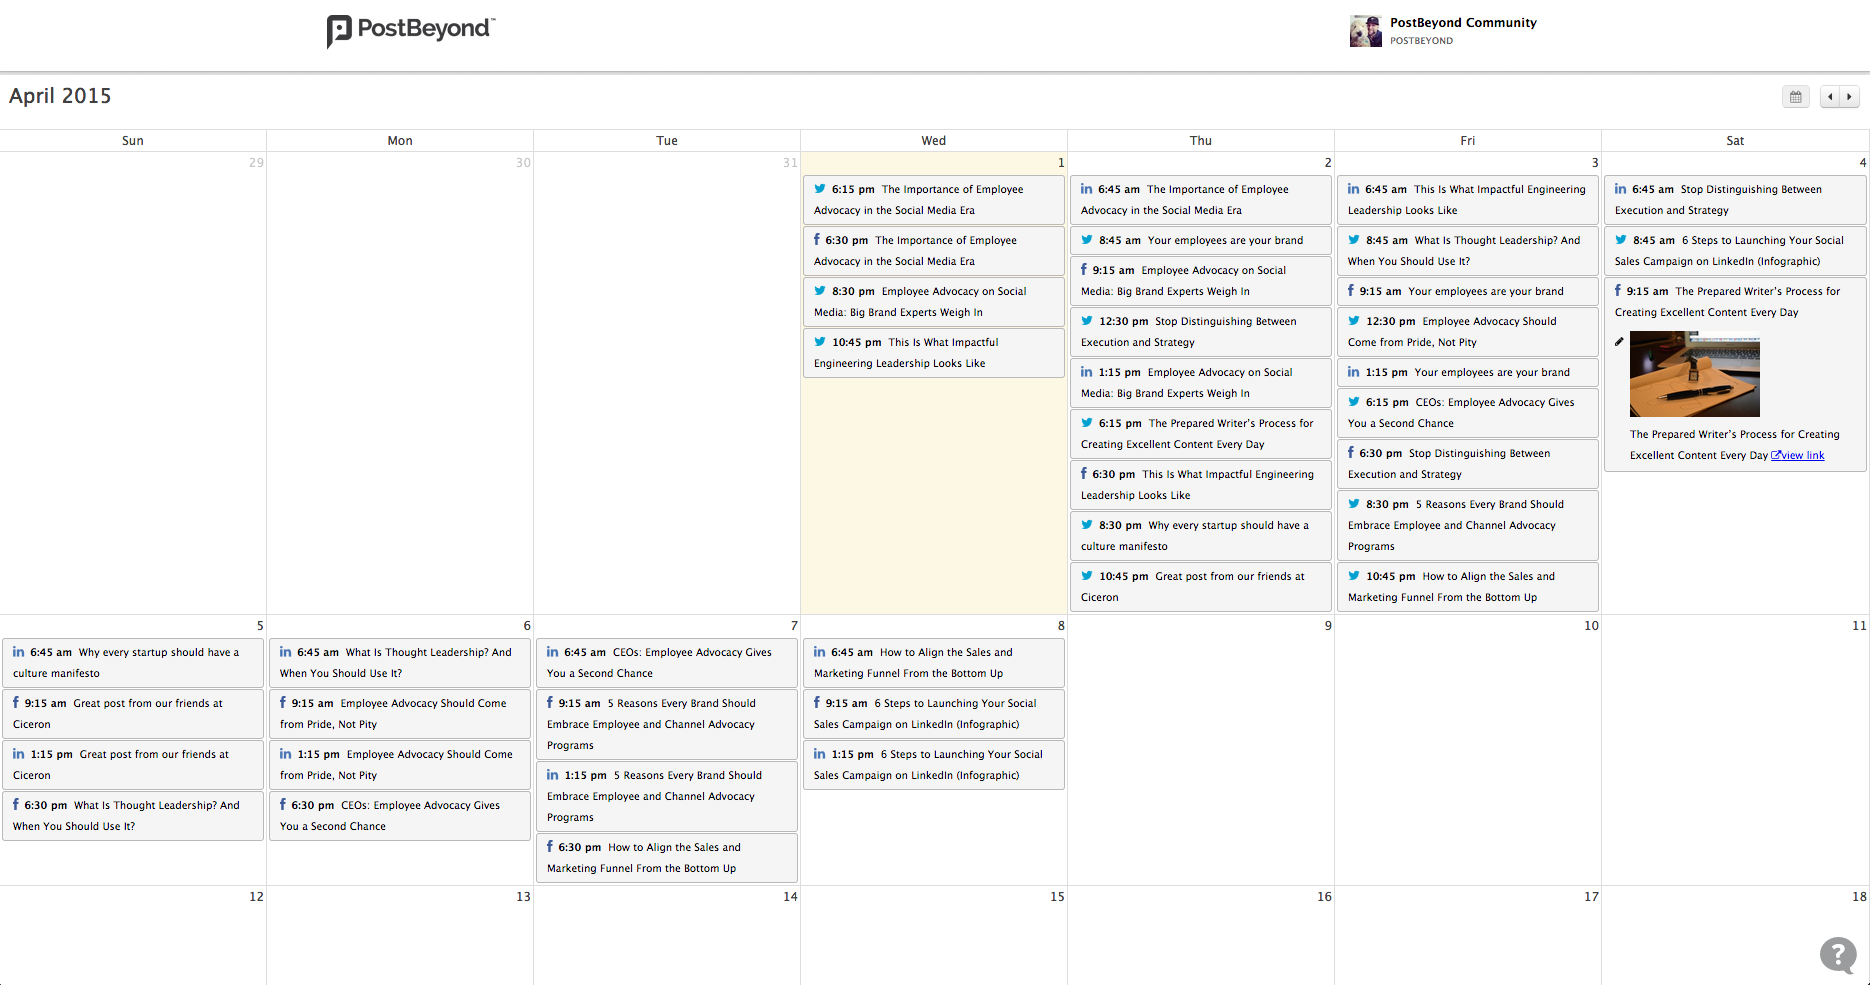 Content Calendar Emplyee Advocacy Features